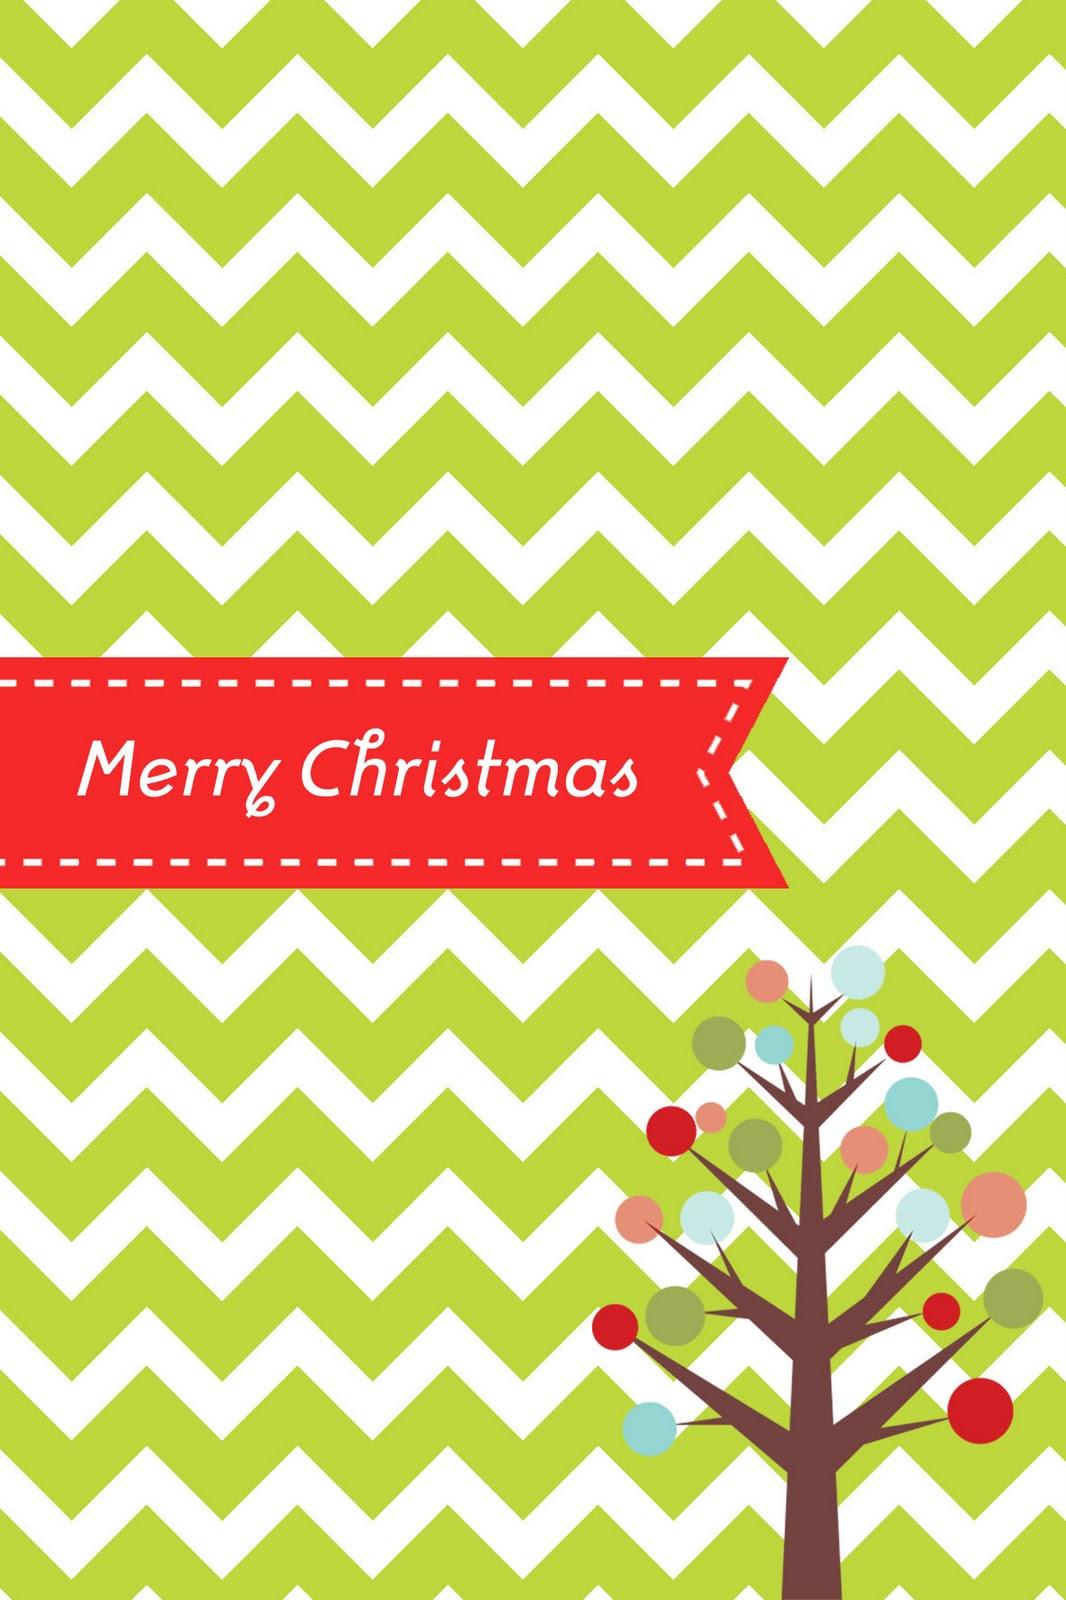 7 Images of Free Printable Chevron Christmas